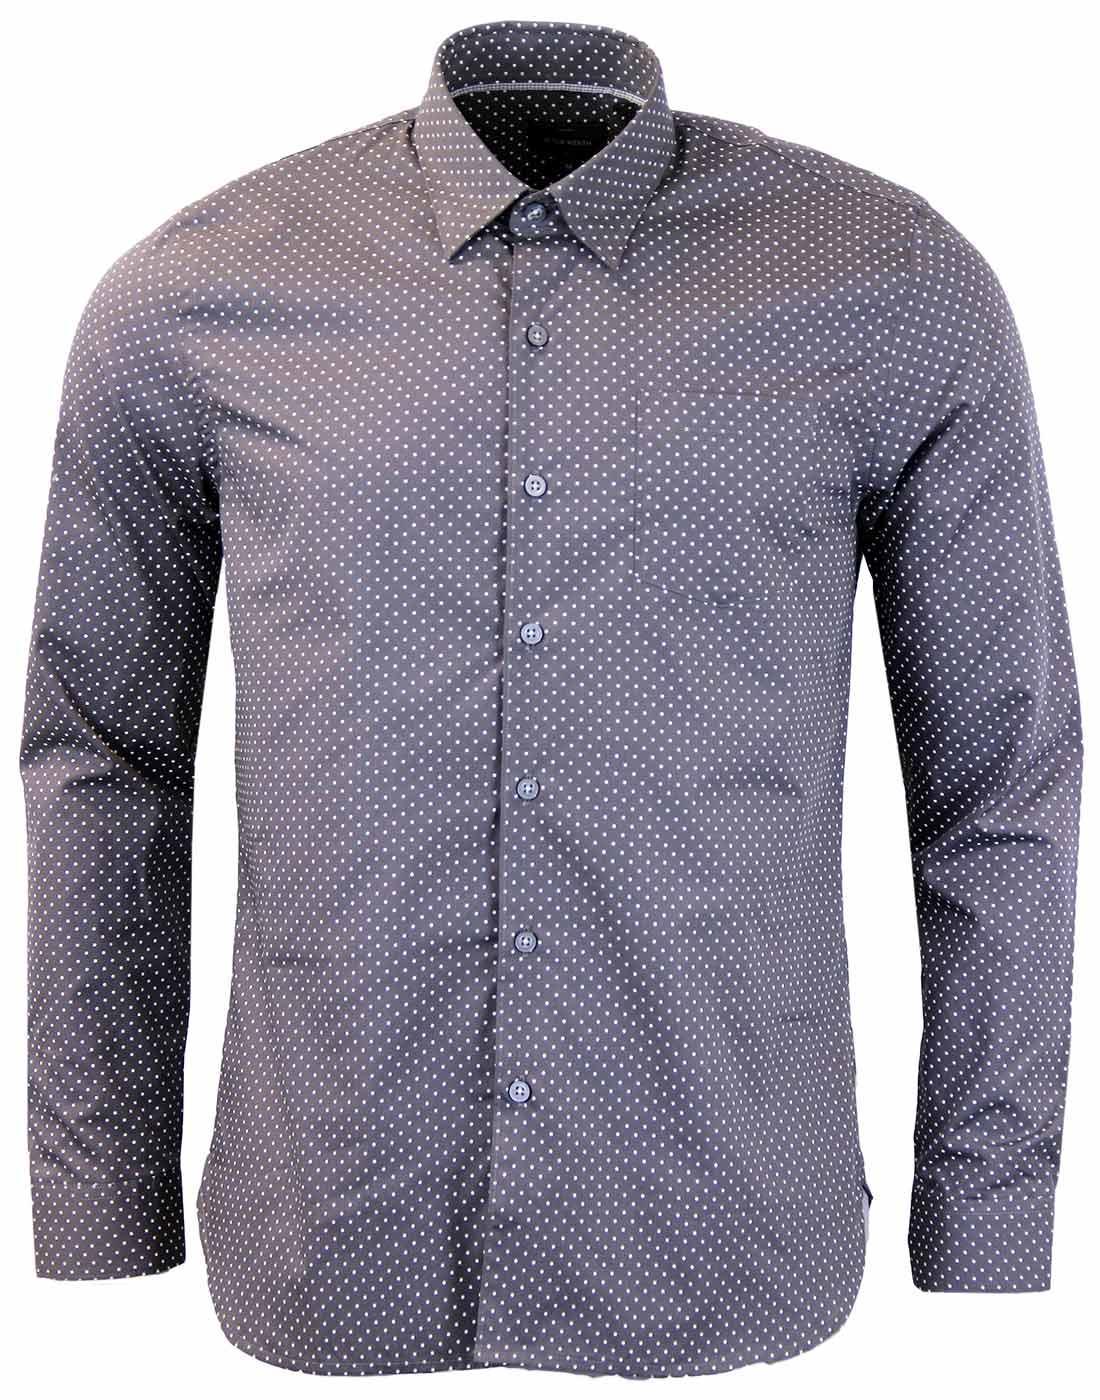 Henshall PETER WERTH Mod Polka Dot Indie Shirt (G)